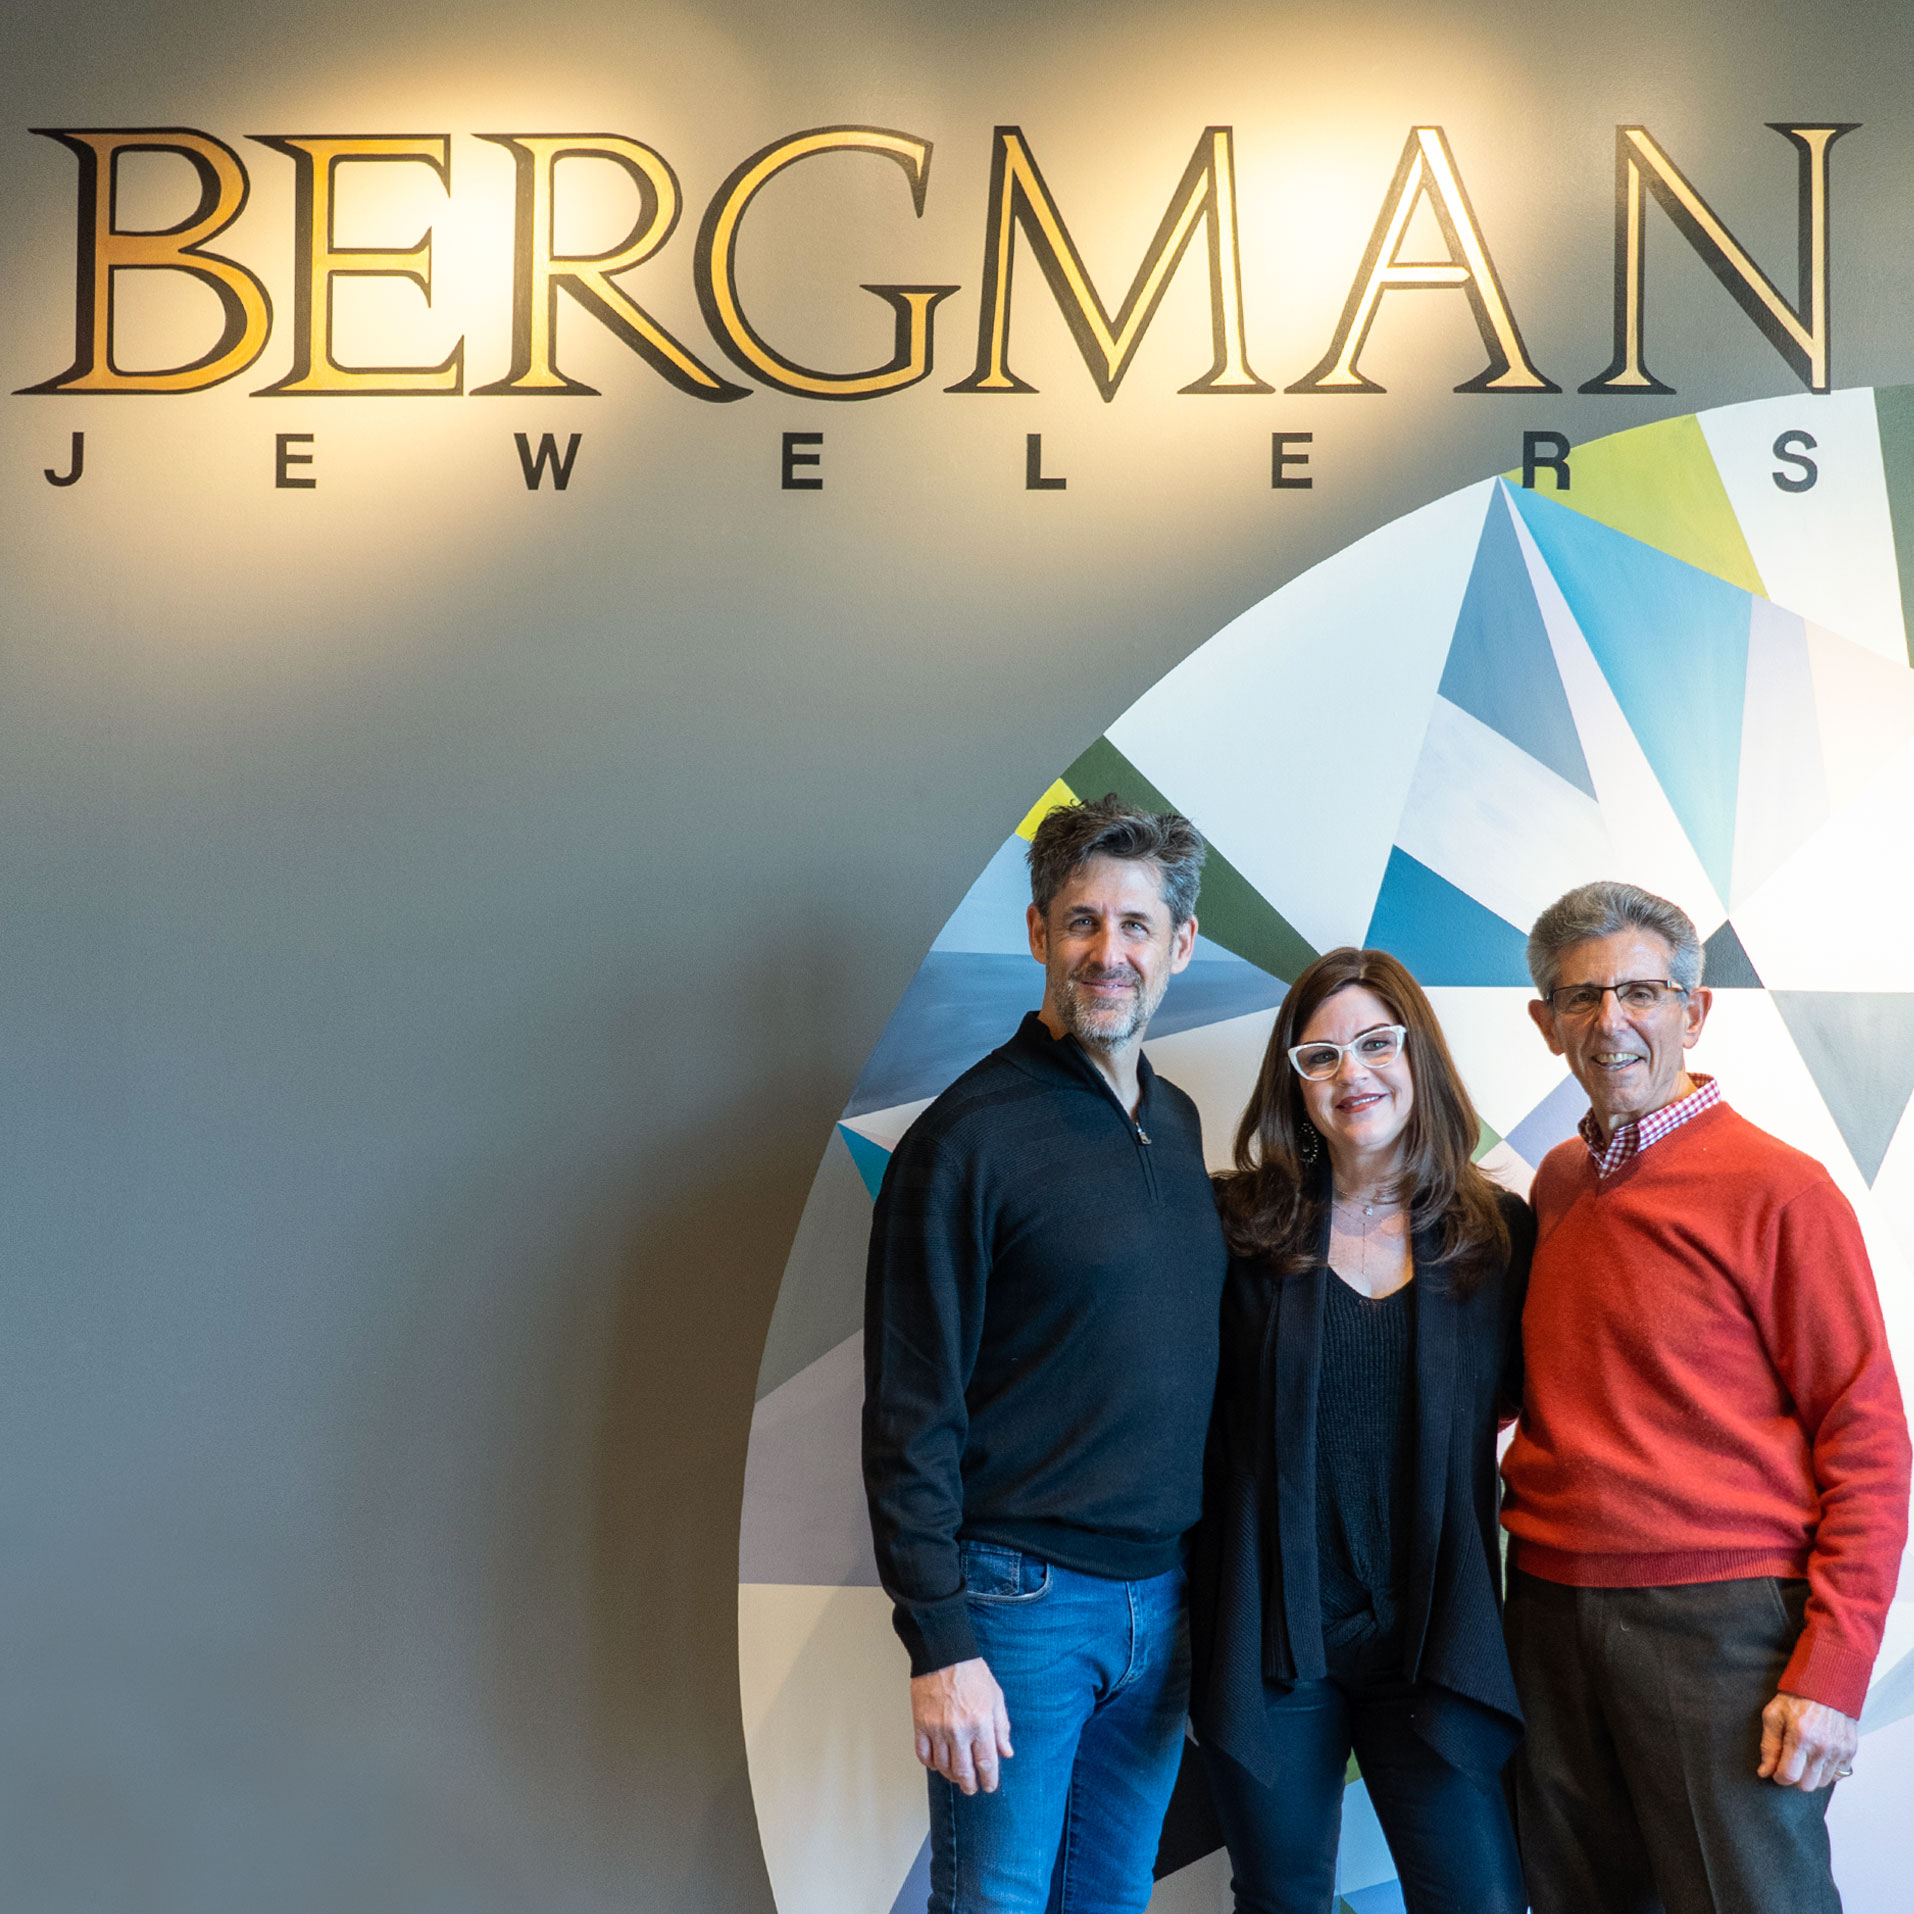 Bergman Staff